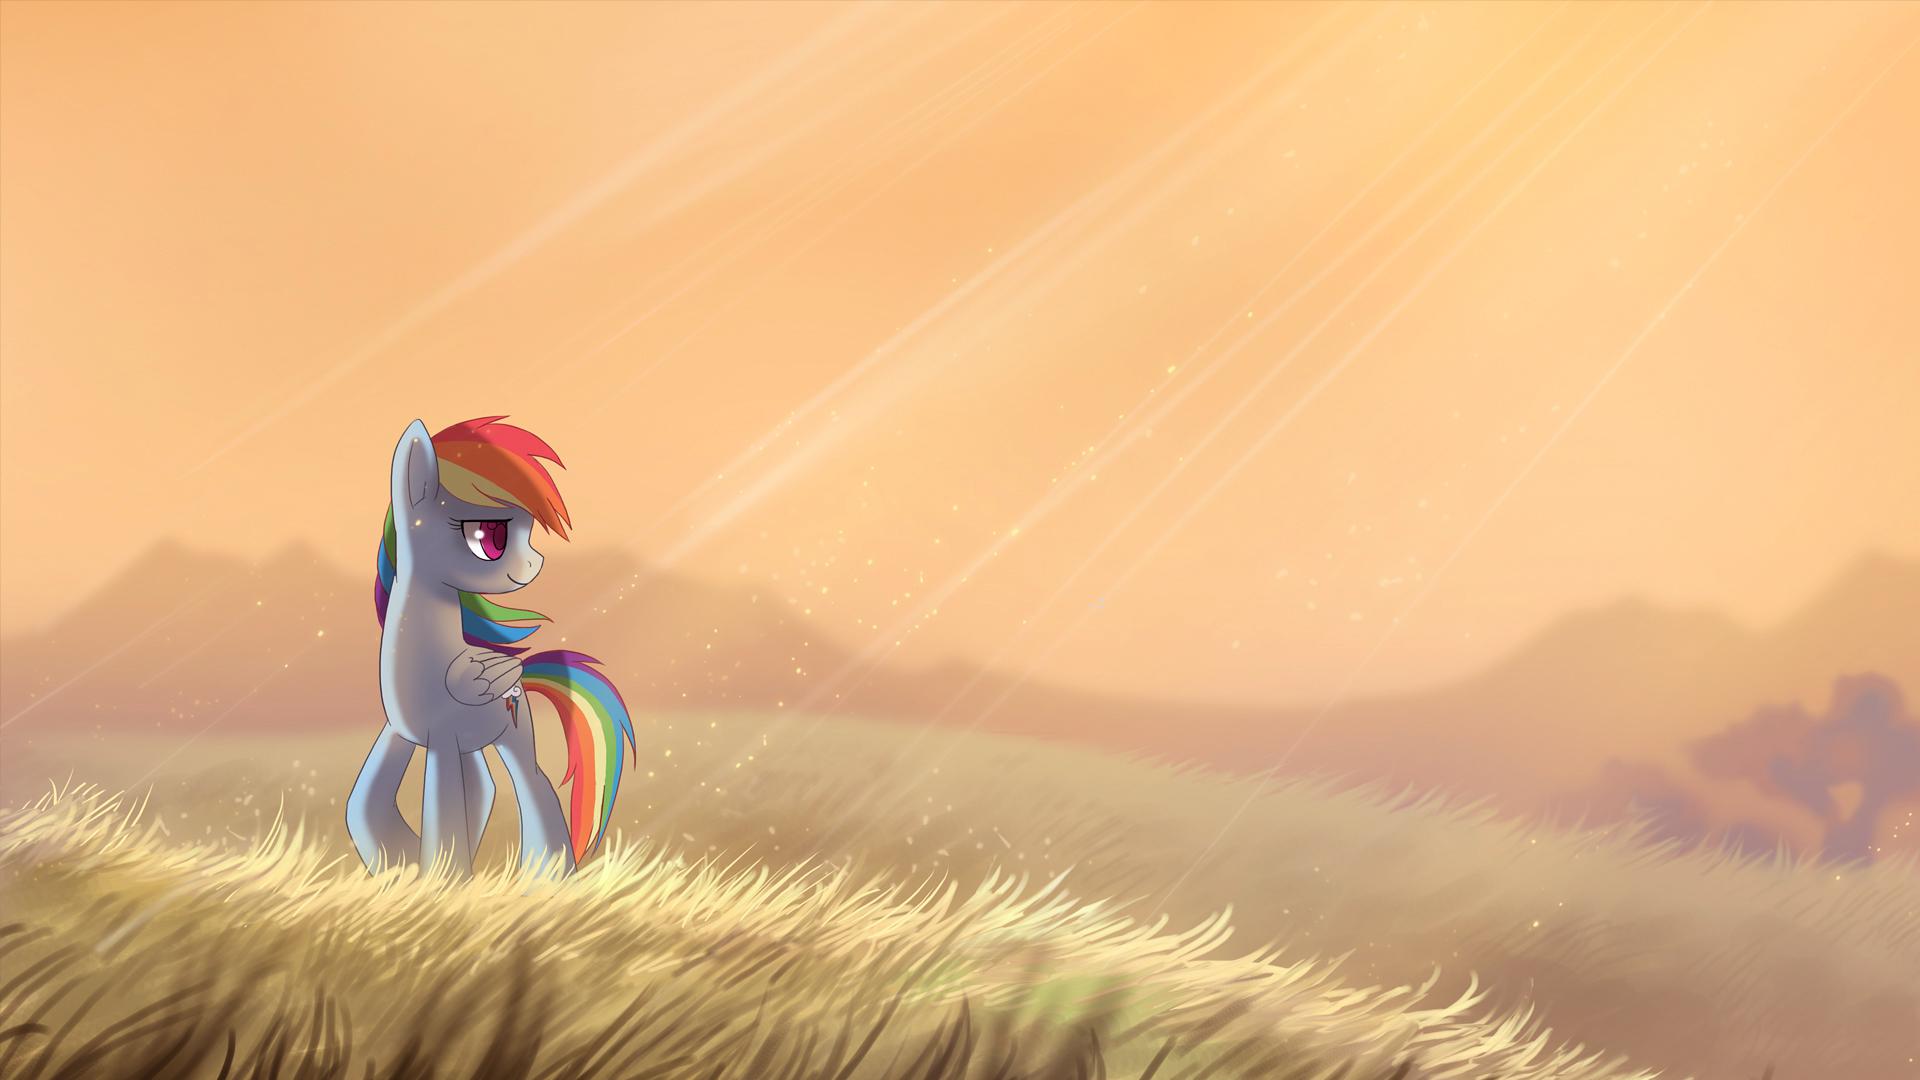 cartoon my little pony friendship is magic my little pony rainbow dash grass monochrome download next wallpaper